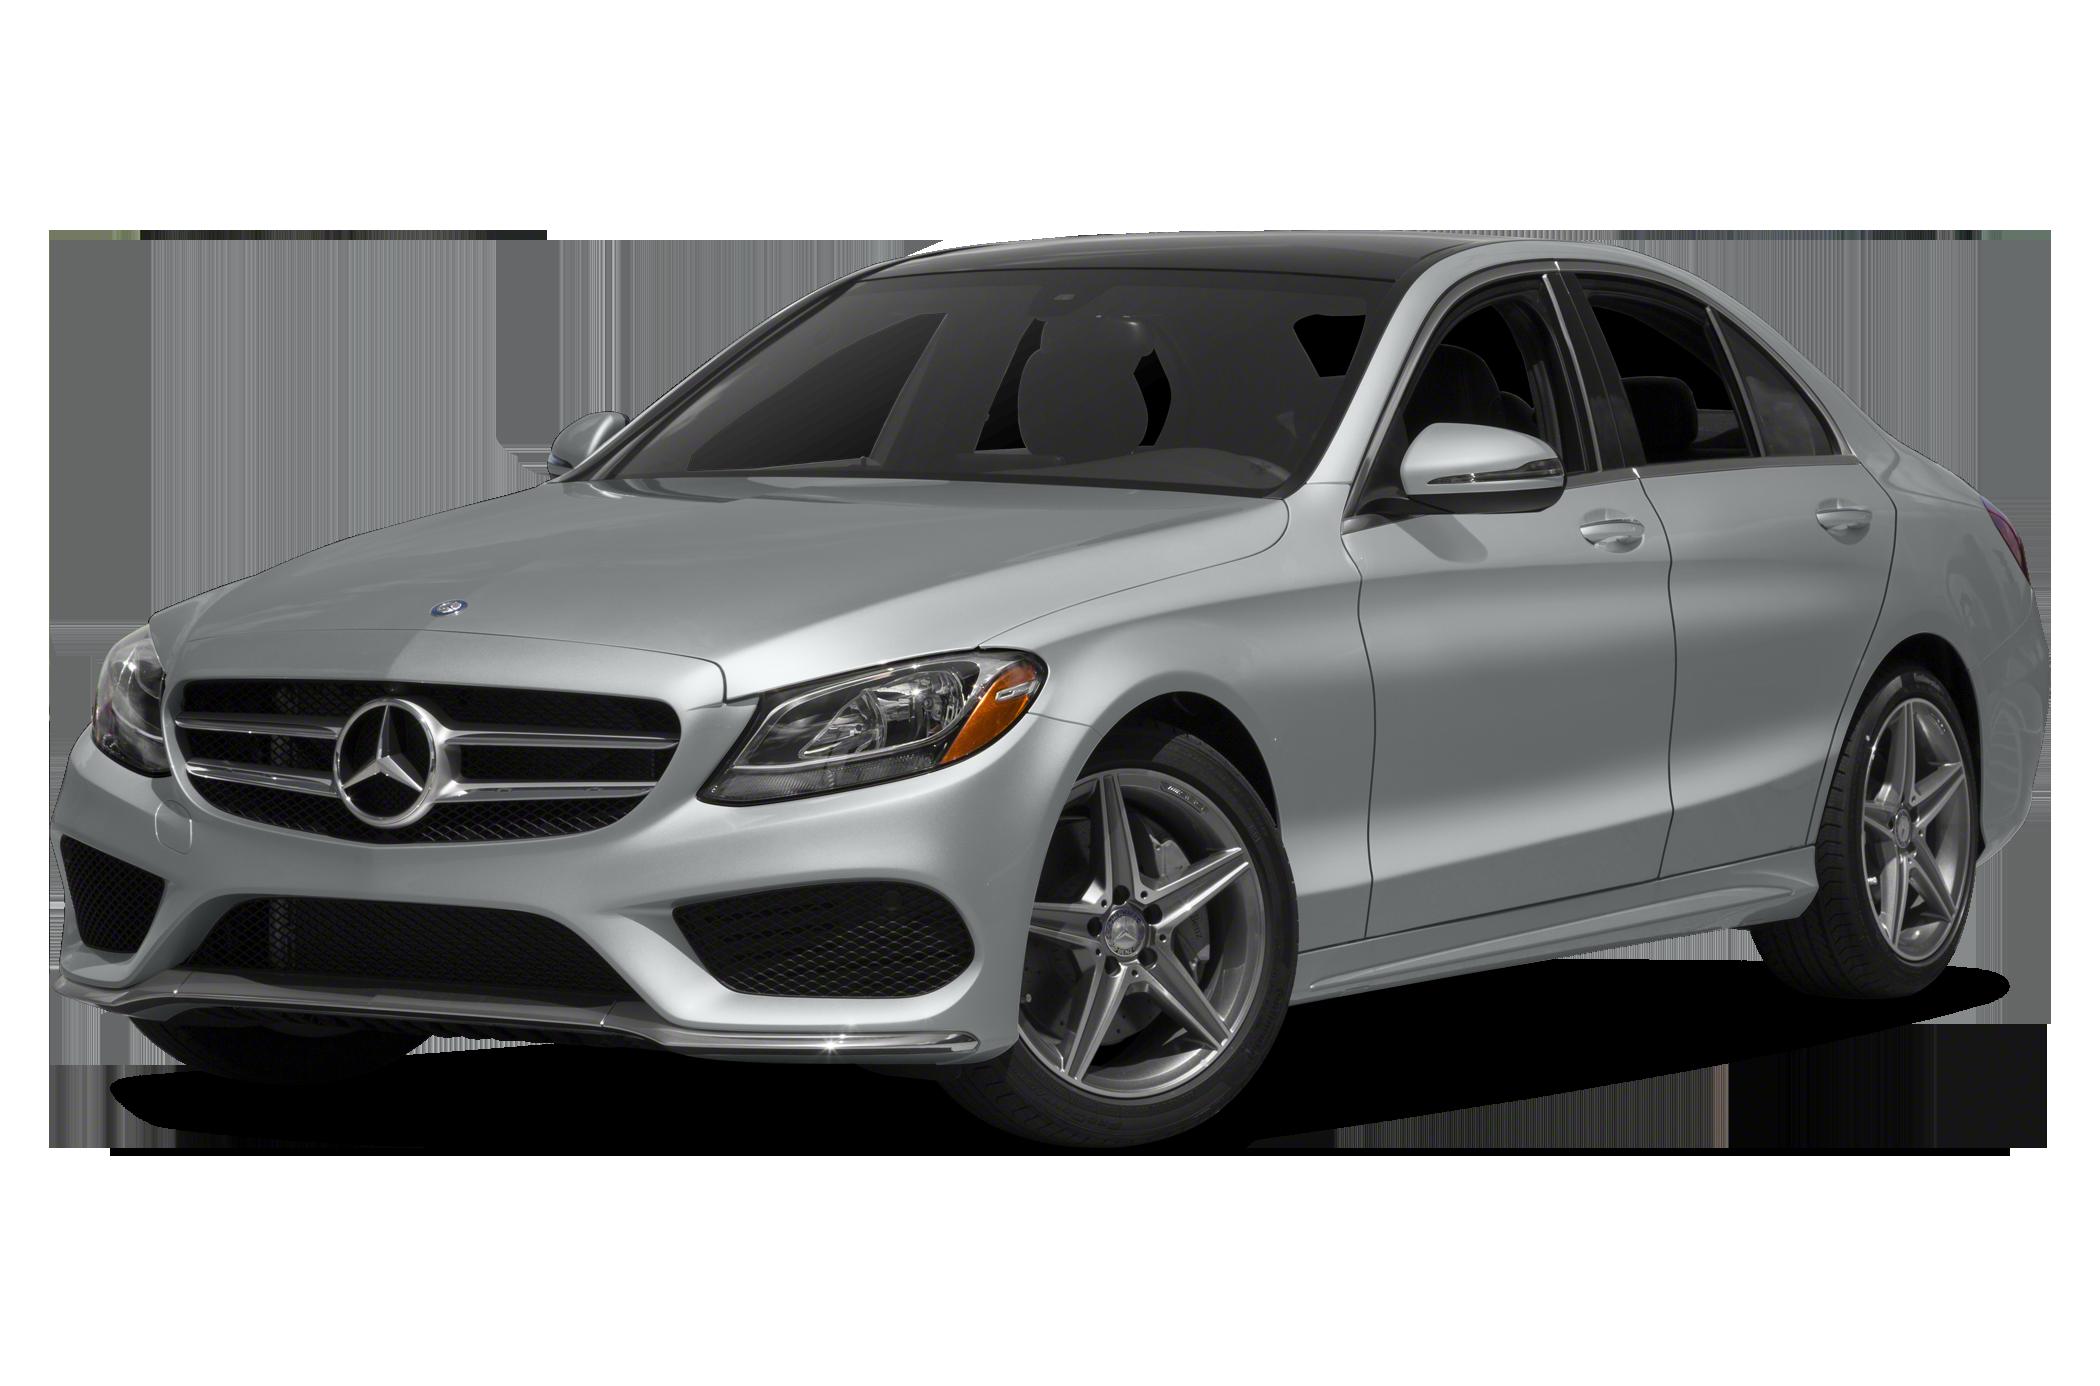 Compare mercedes benz c300 to mercedes benz cla250 for Mercedes benz compare